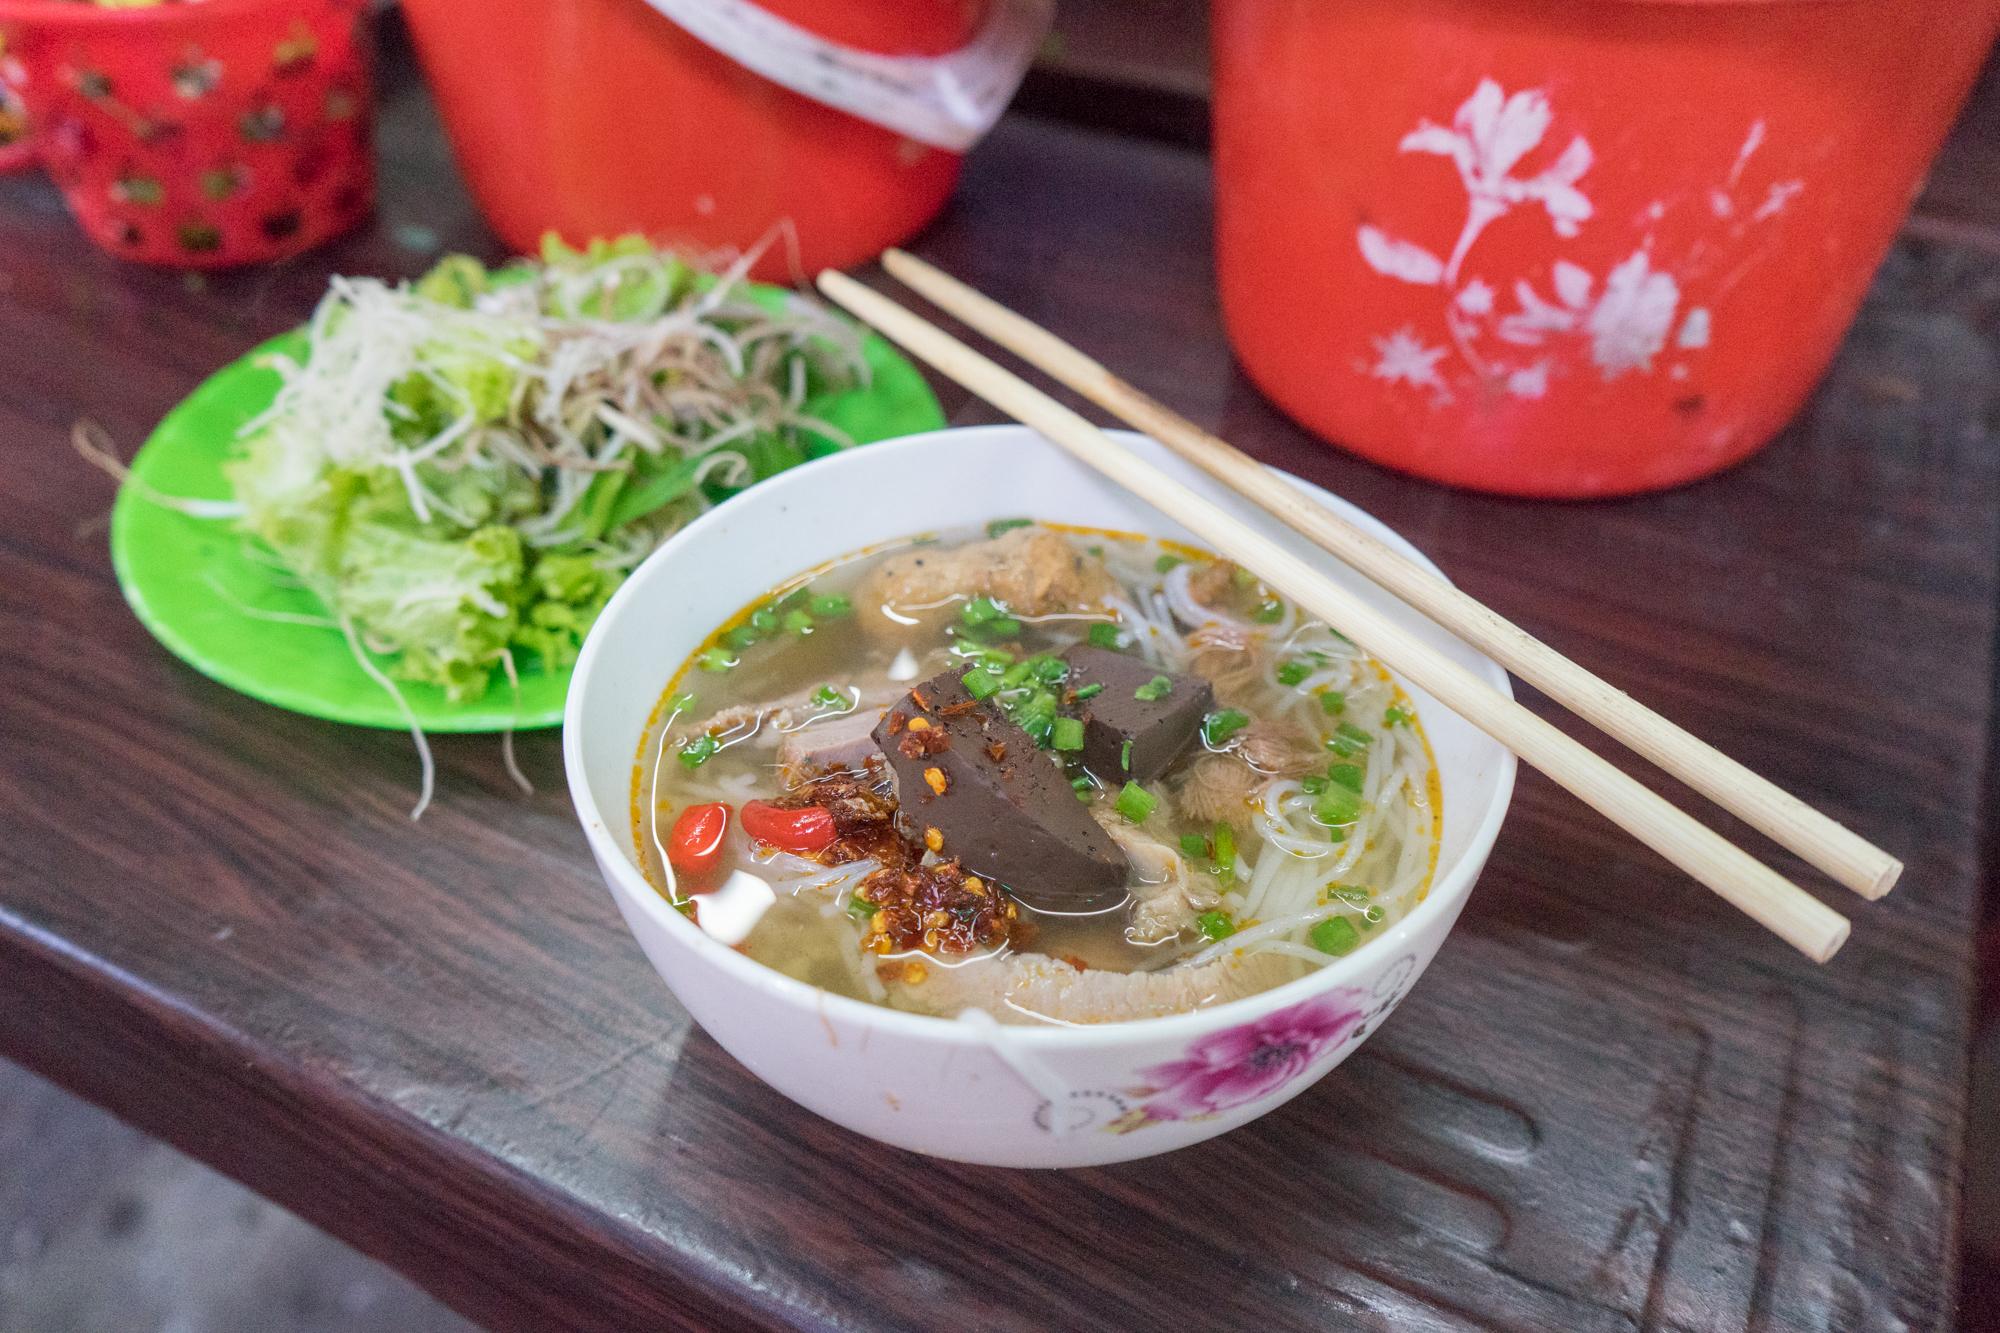 Anthony Bourdain's Bun Bo Hue Stall at Dong Ba Market in Hue Vietnam